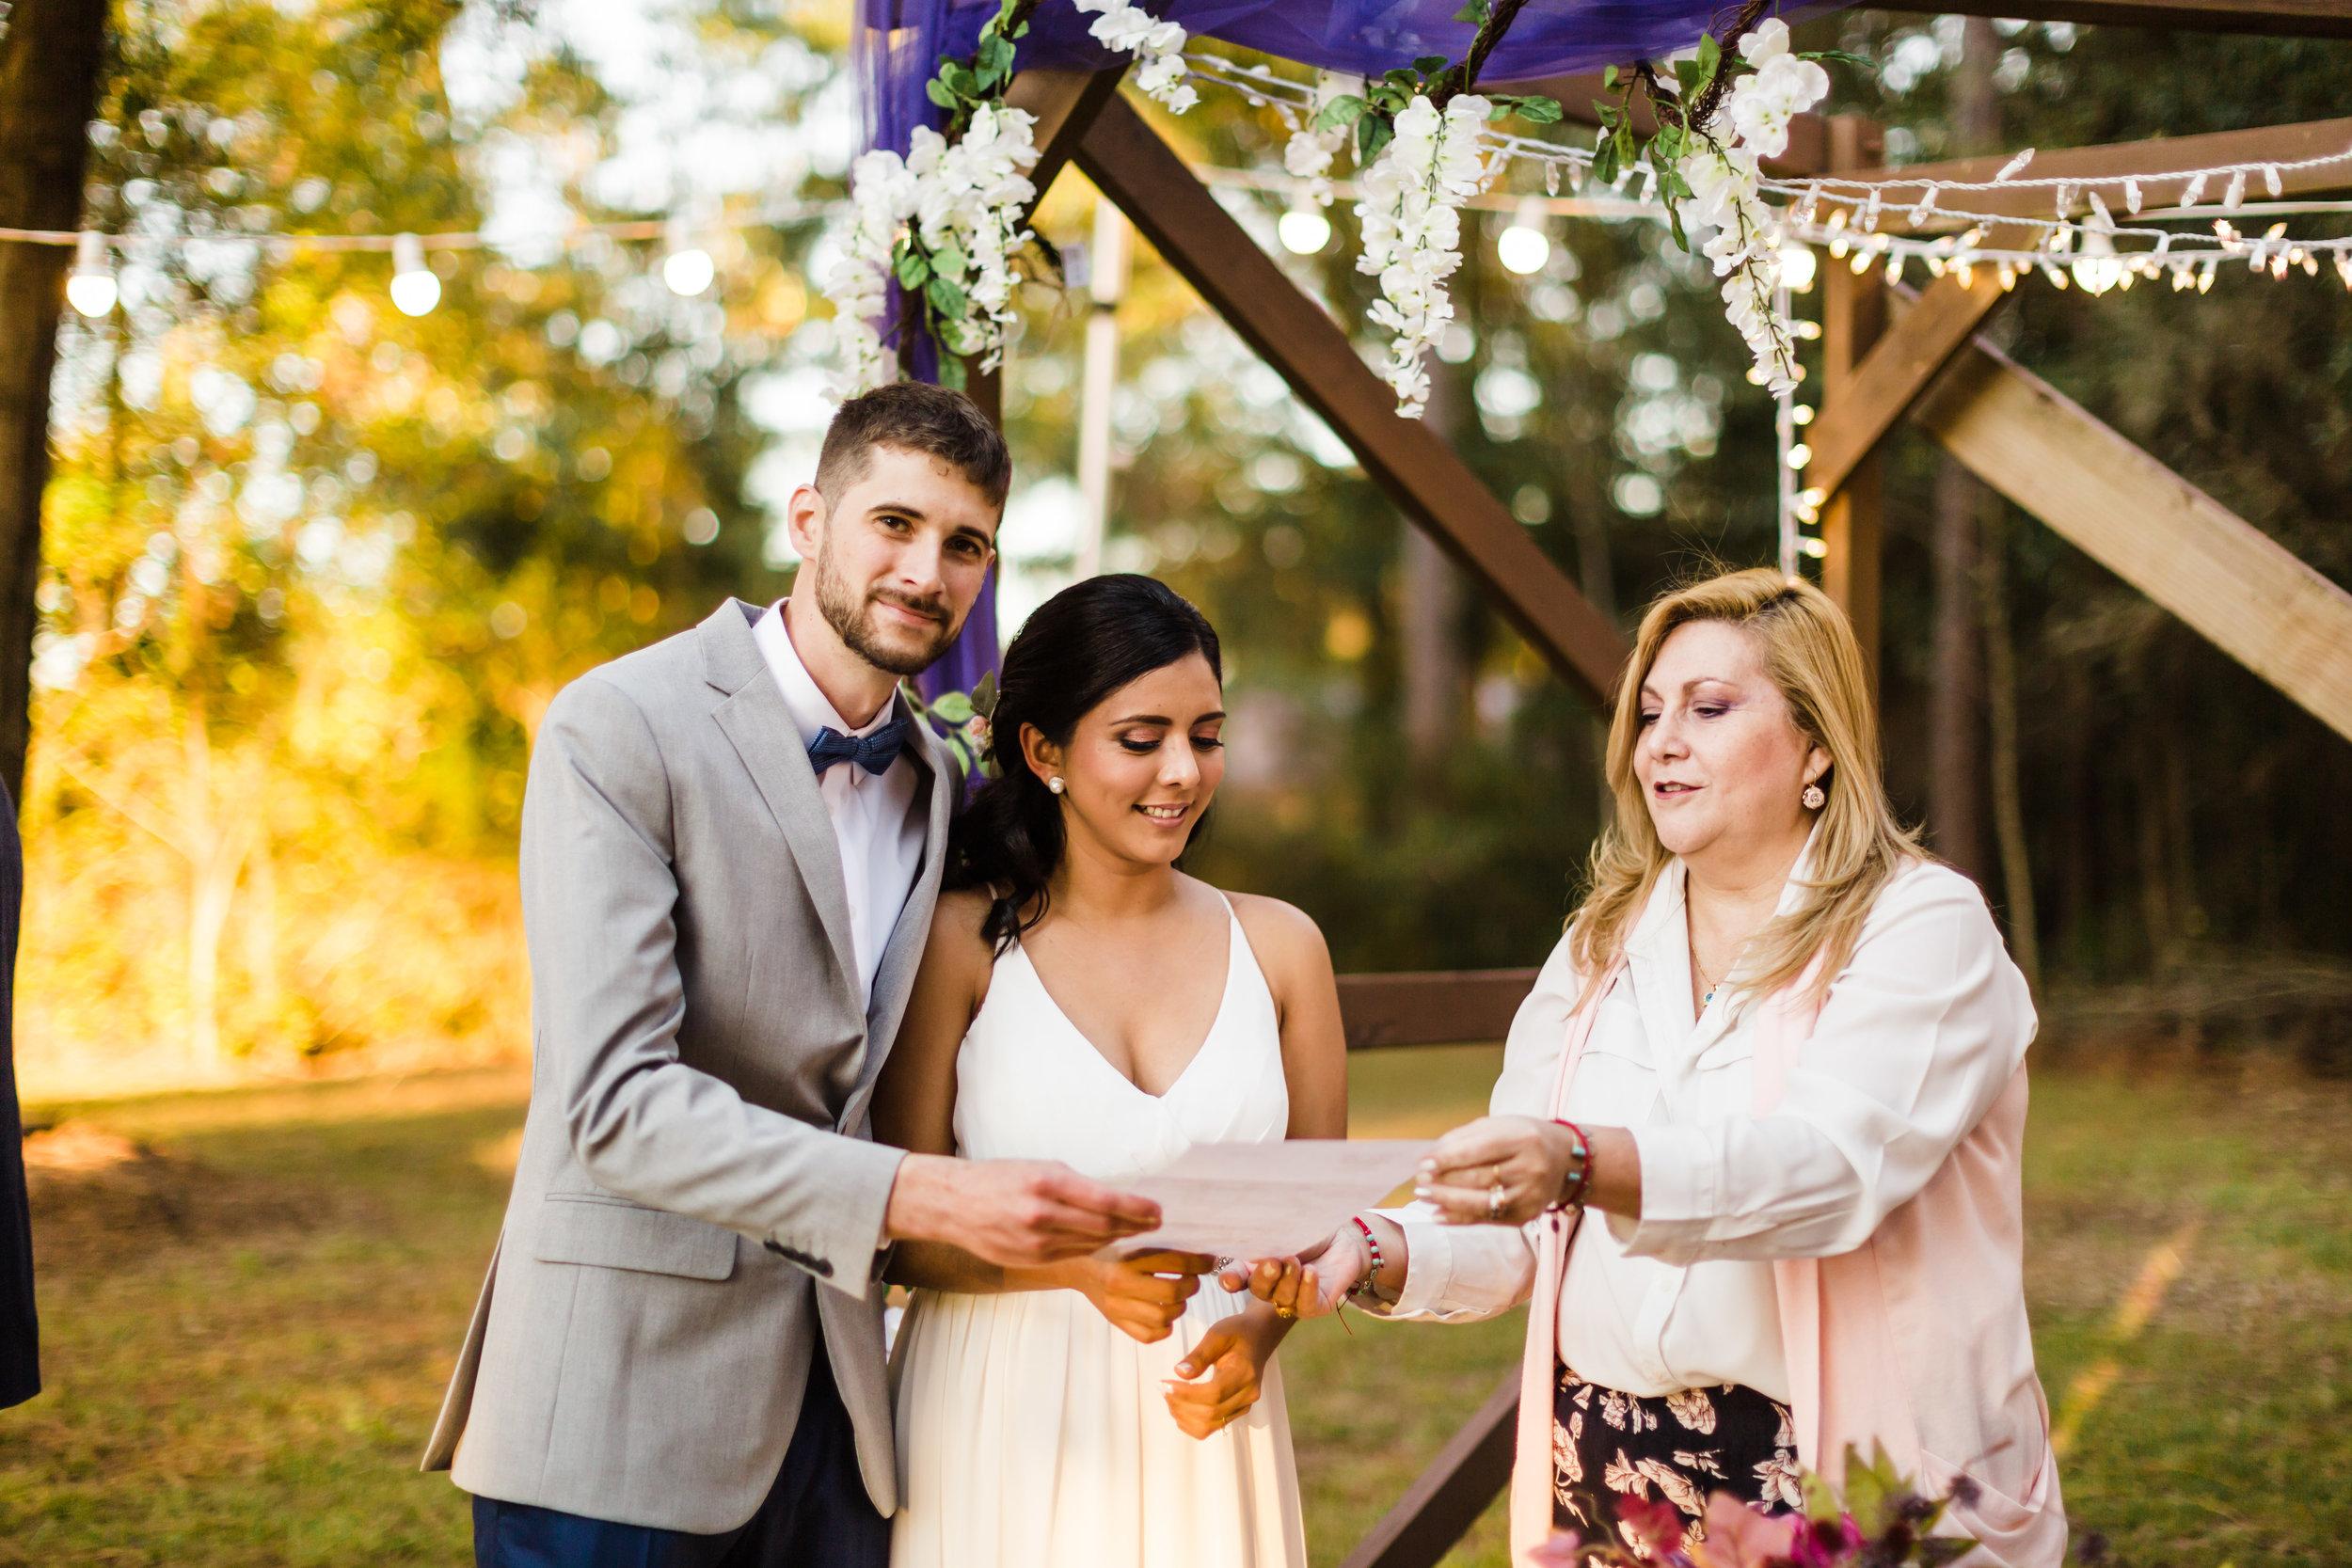 2018.11.03 Jael and Edel Ocala Wedding FINALS (264 of 441).jpg